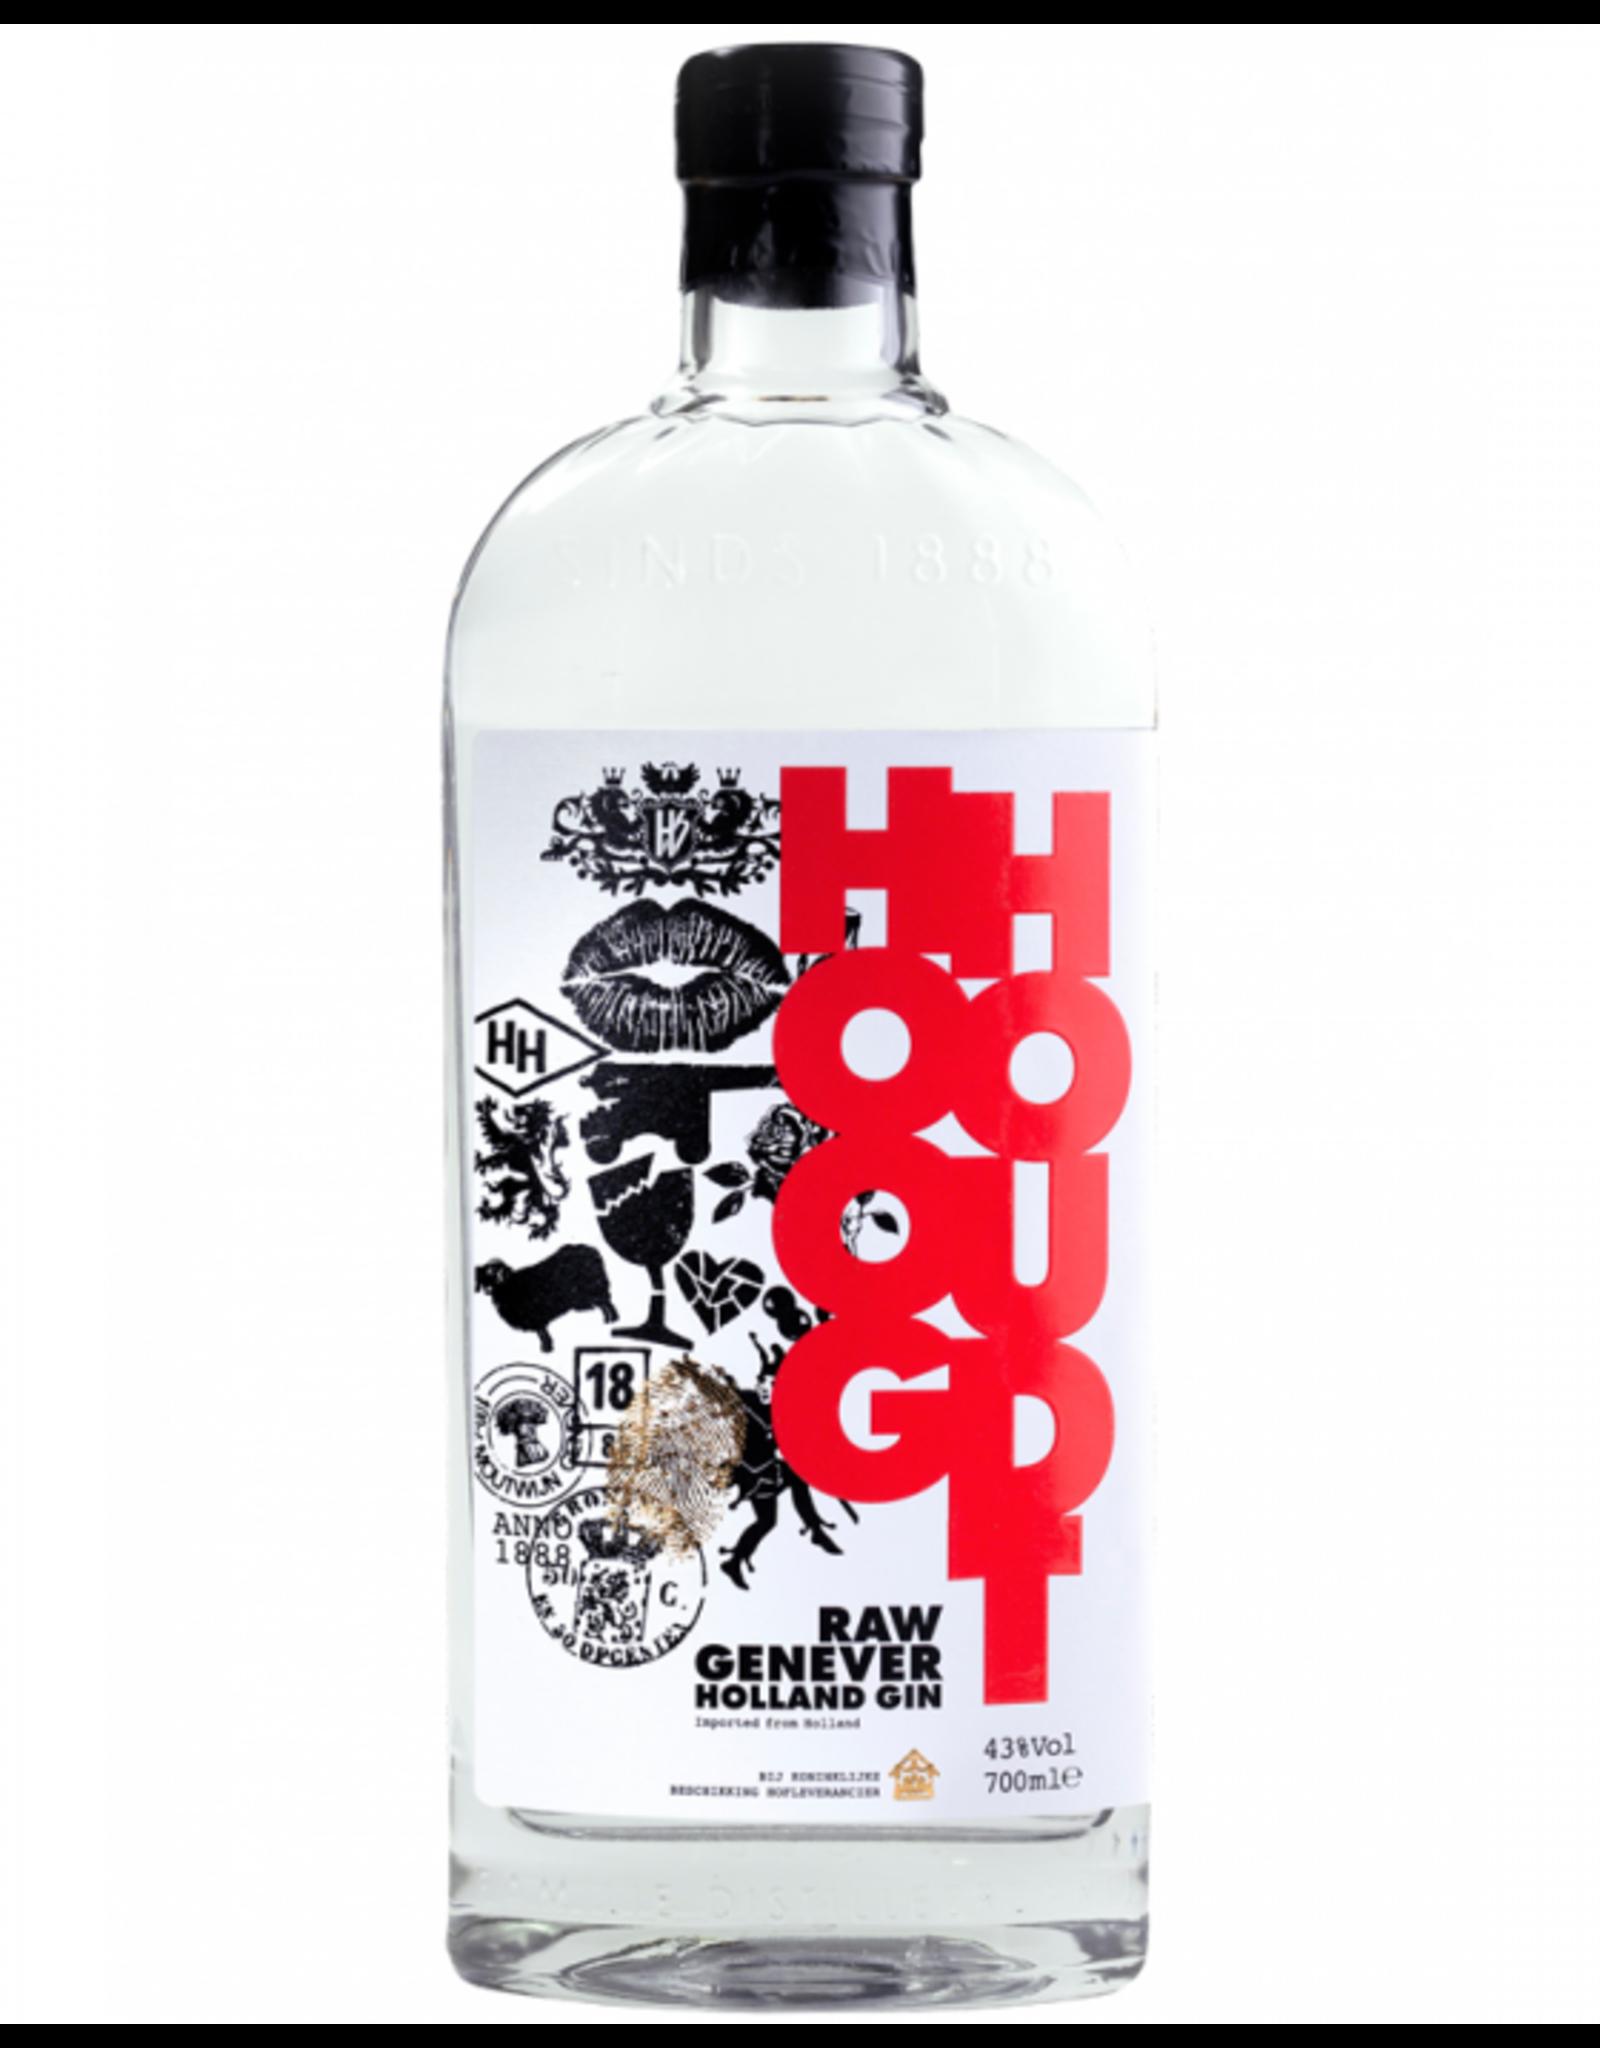 Hooghoudt Hooghoudt Raw Genever Holland Gin 70cl